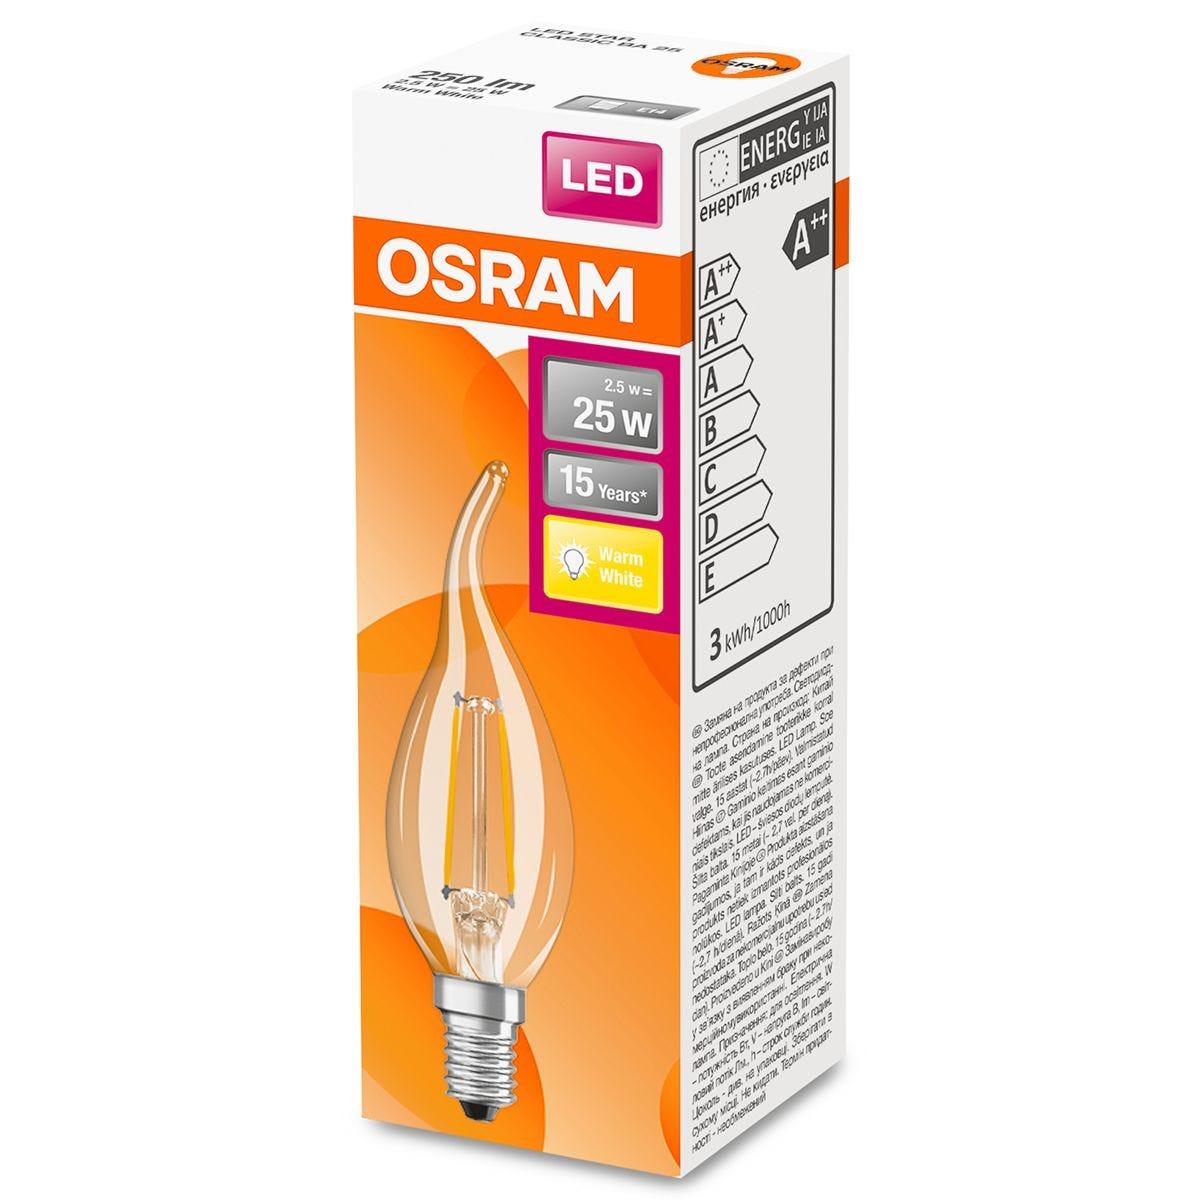 Osram Candle BA 25W Clear Filament SES Bulb - Warm White